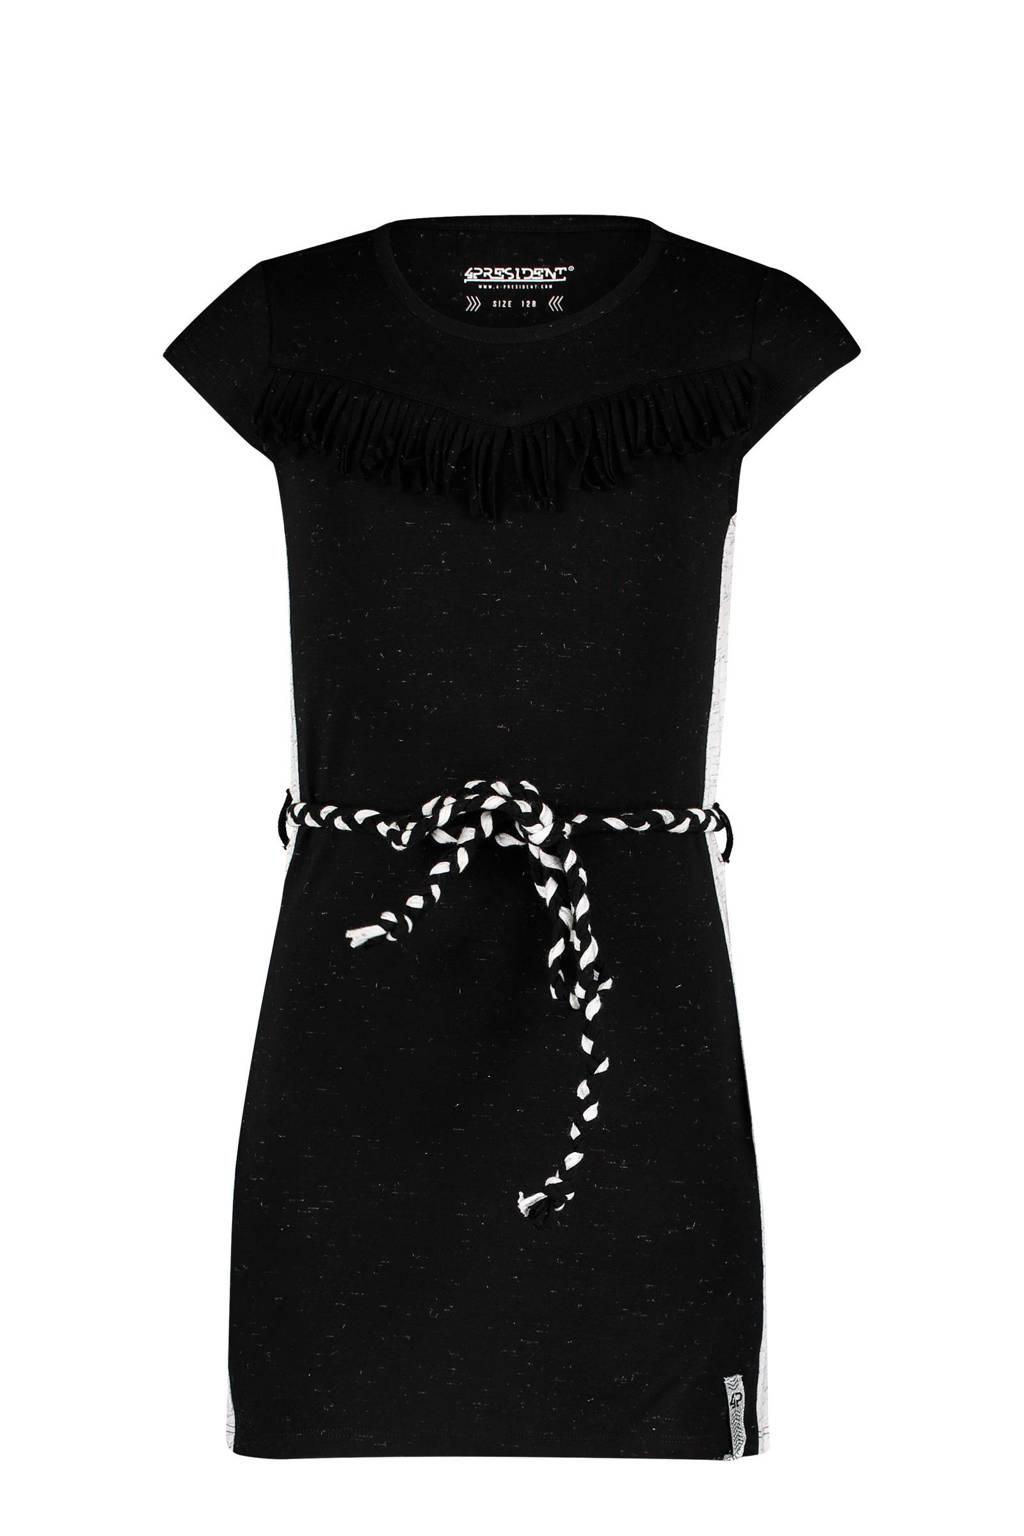 4PRESIDENT jurk Karsyn met contrastbies en ceintuur zwart/wit, Zwart/wit